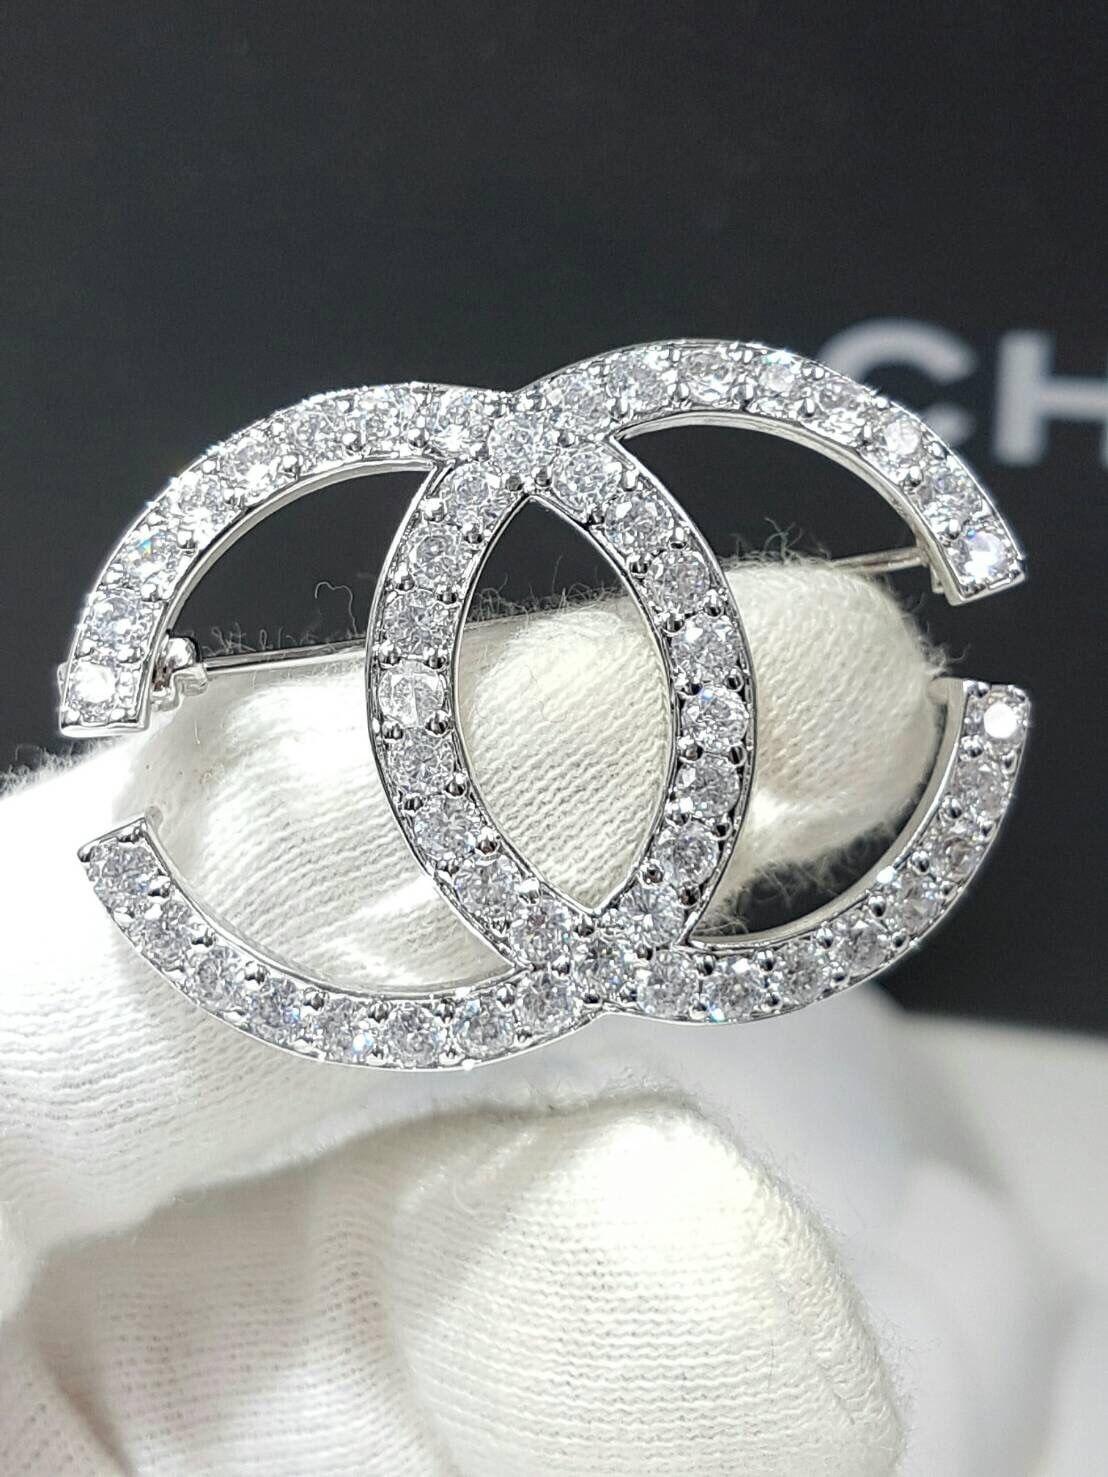 Diamond chanel